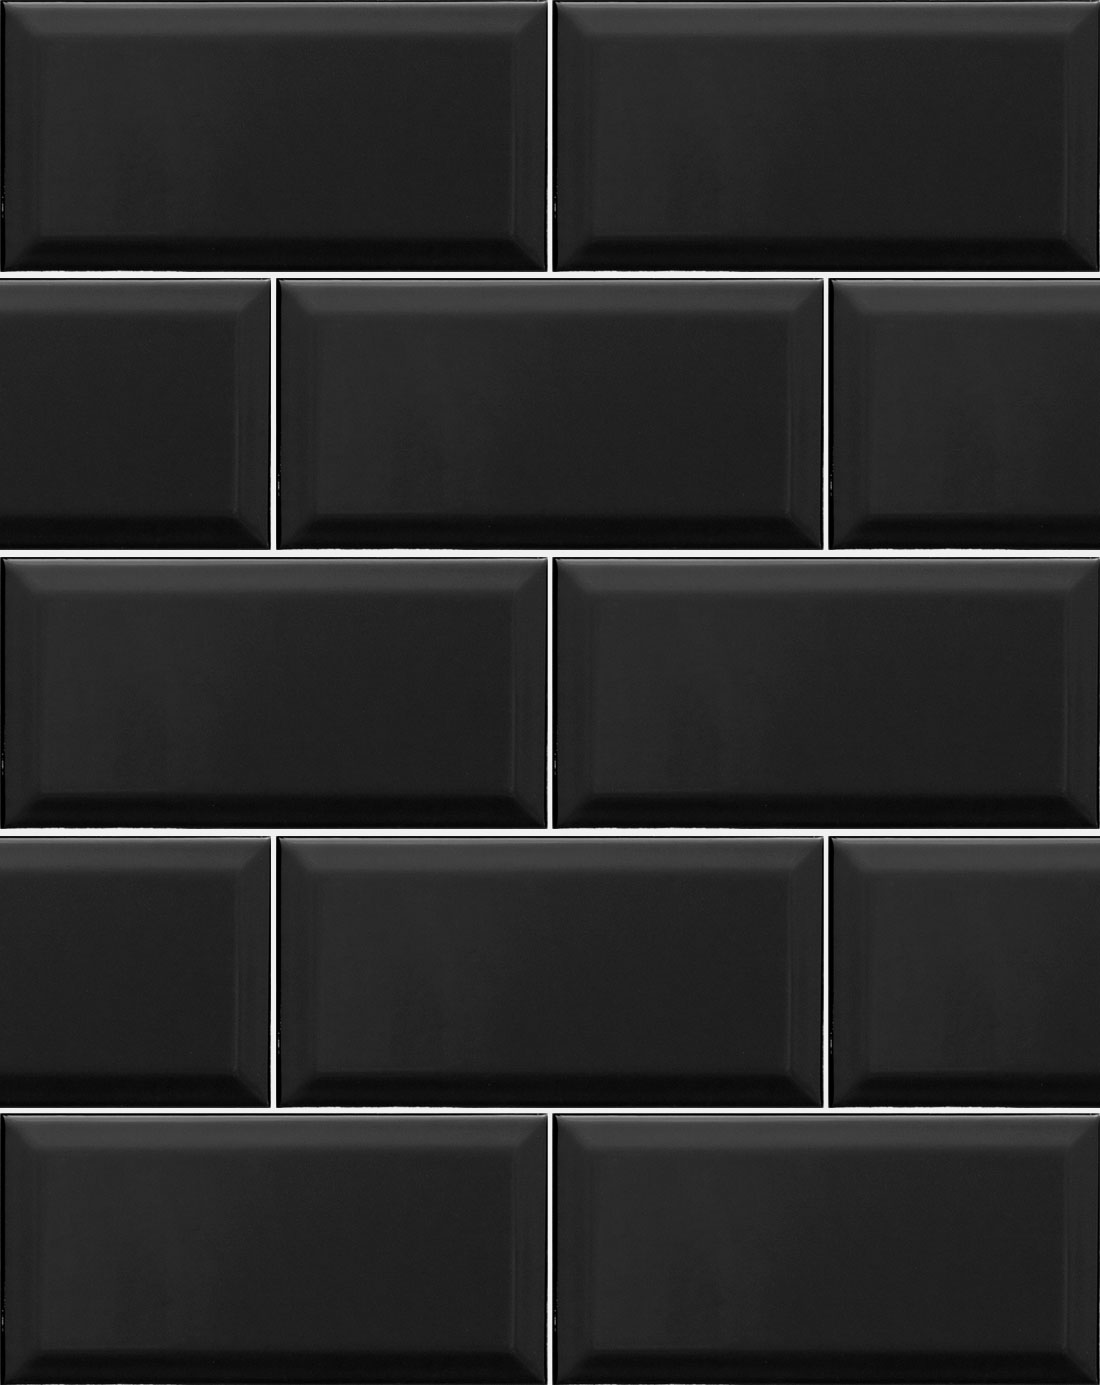 New  Blackwhite_cooltexturedgreywallsbathroom_bathroom_bathroomideas